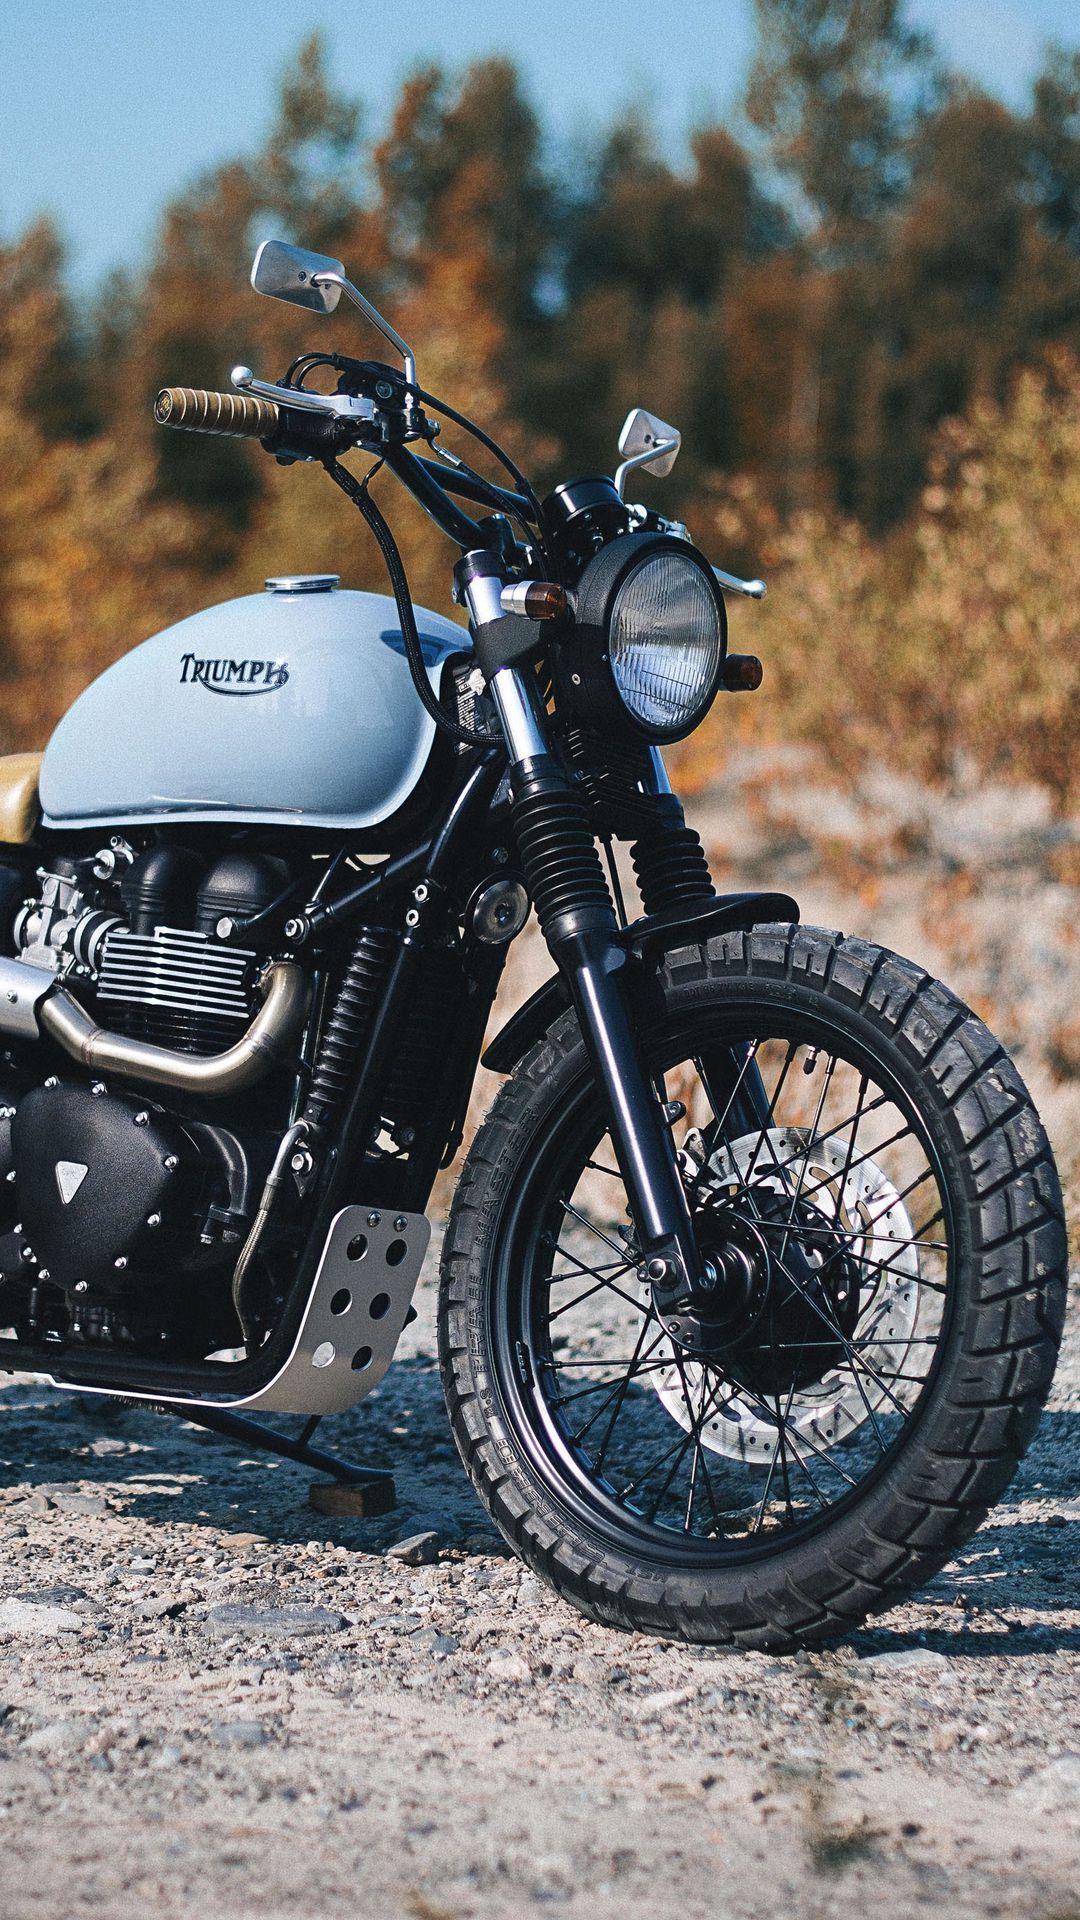 1080x1920 Обои triumph, bonneville, мотоцикл, вид сбоку